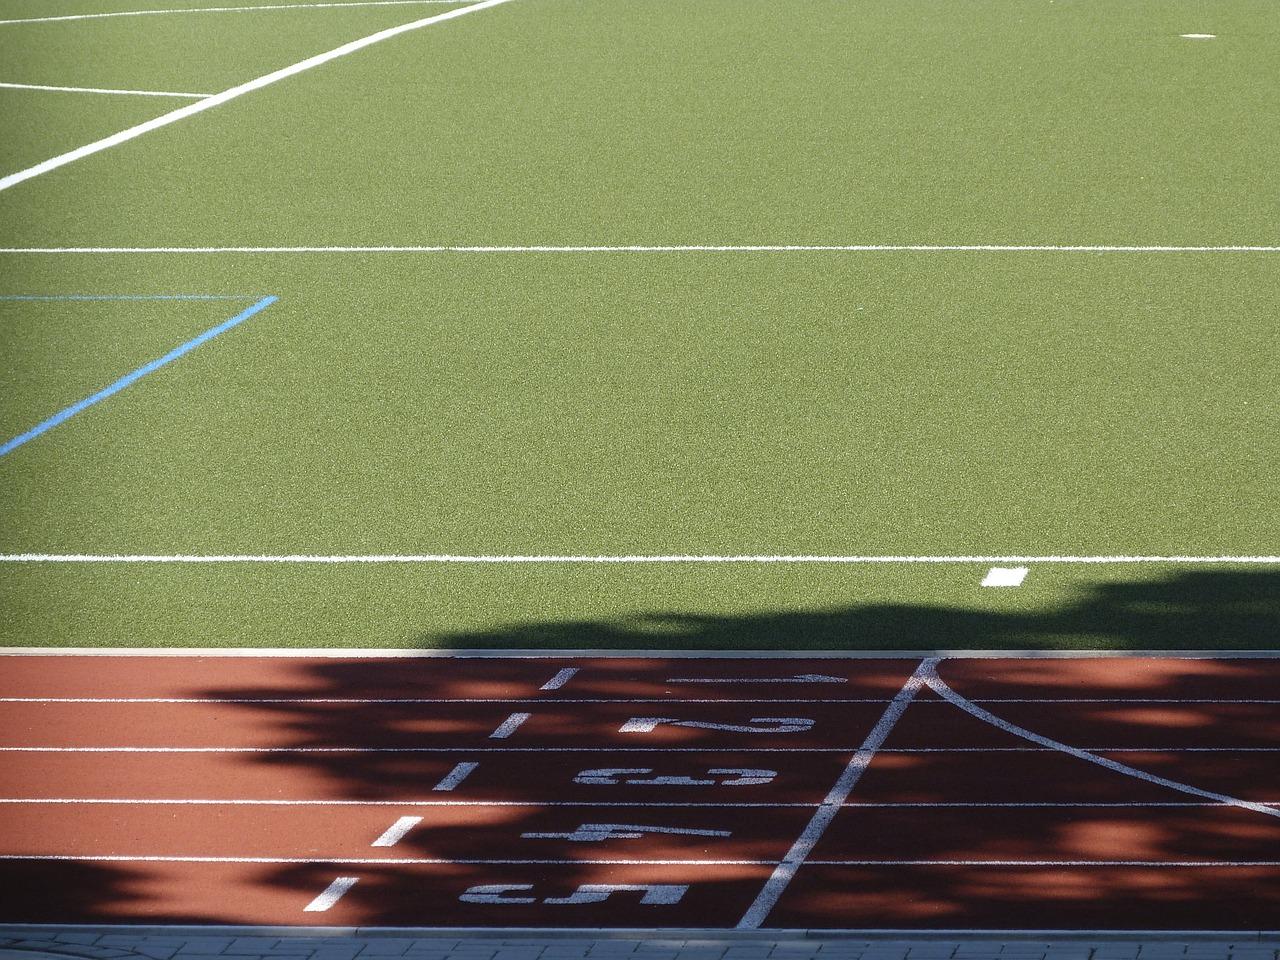 running, track, finish line